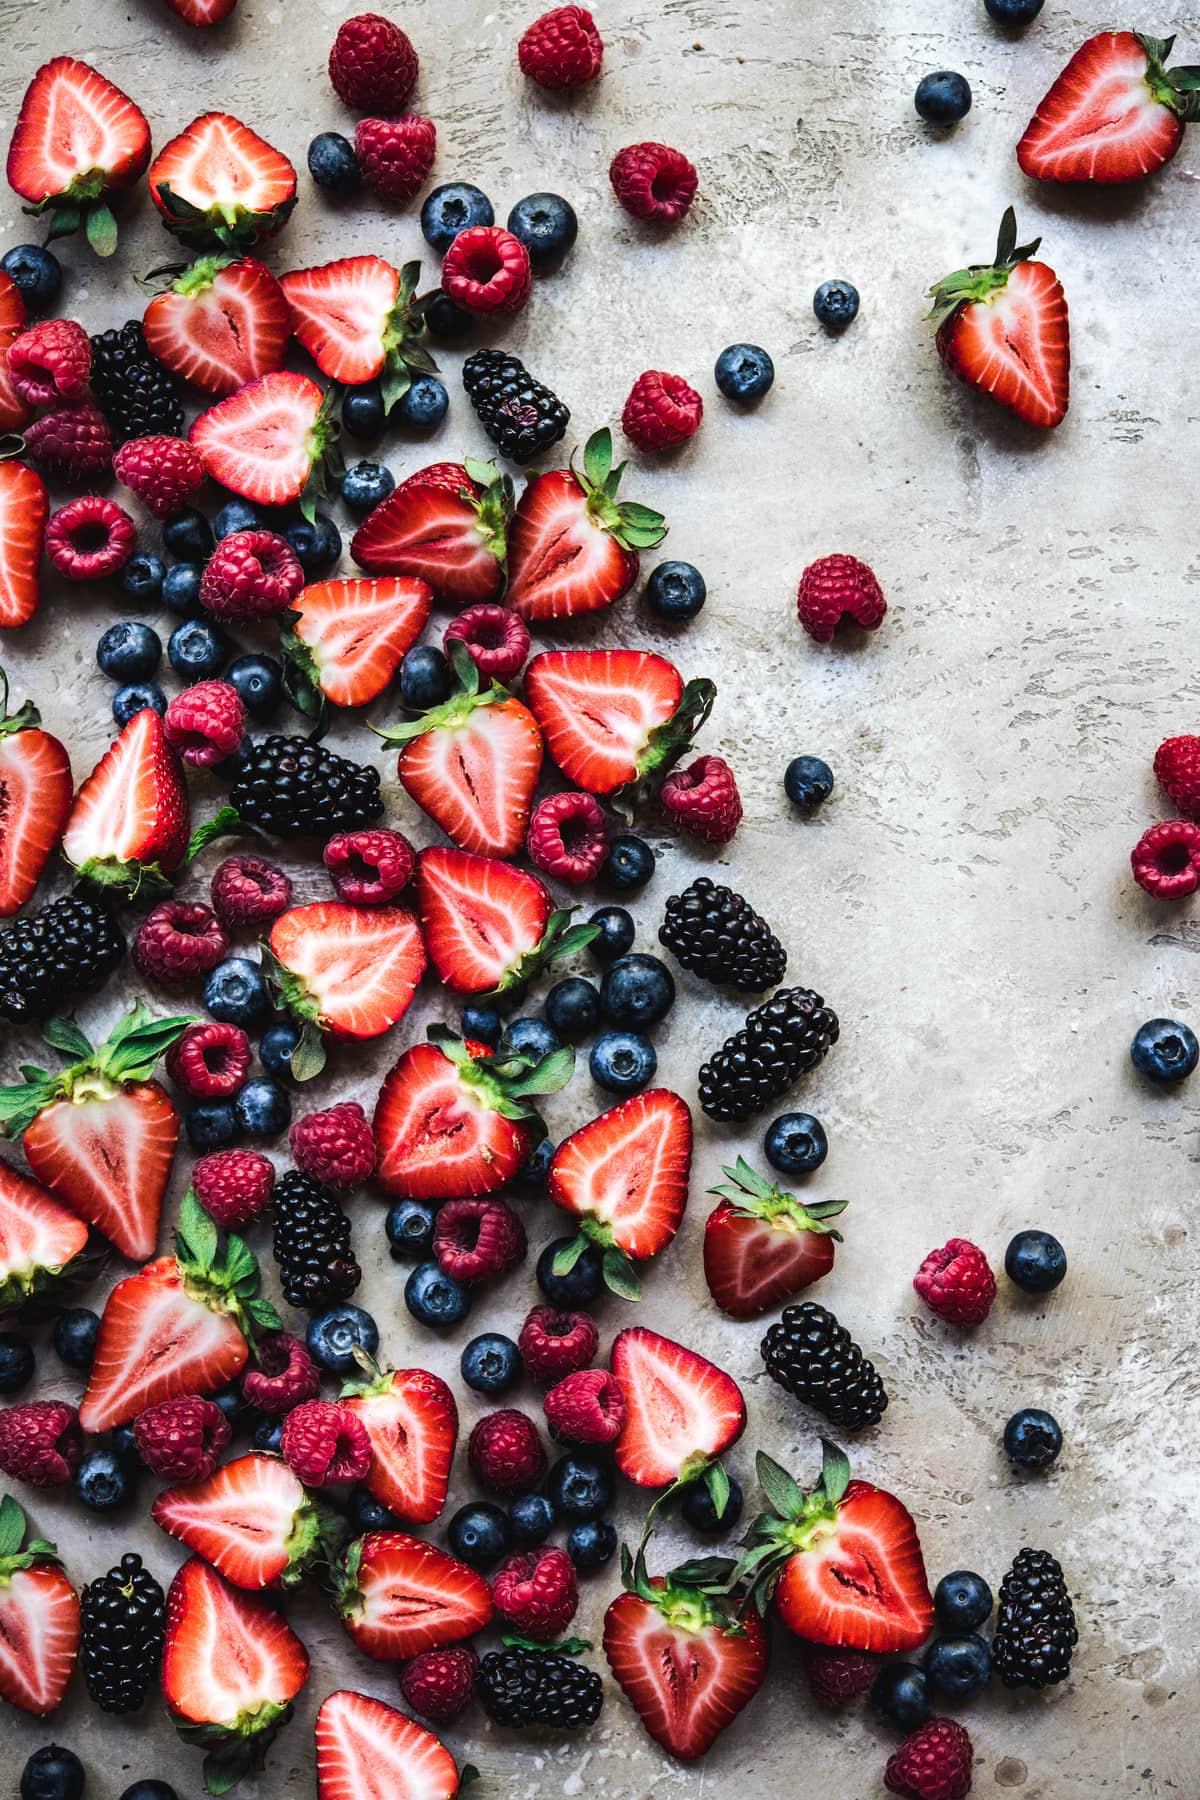 Overhead view of beautiful food photography of fresh blueberries, raspberries, strawberries and blackberries on rustic tan background